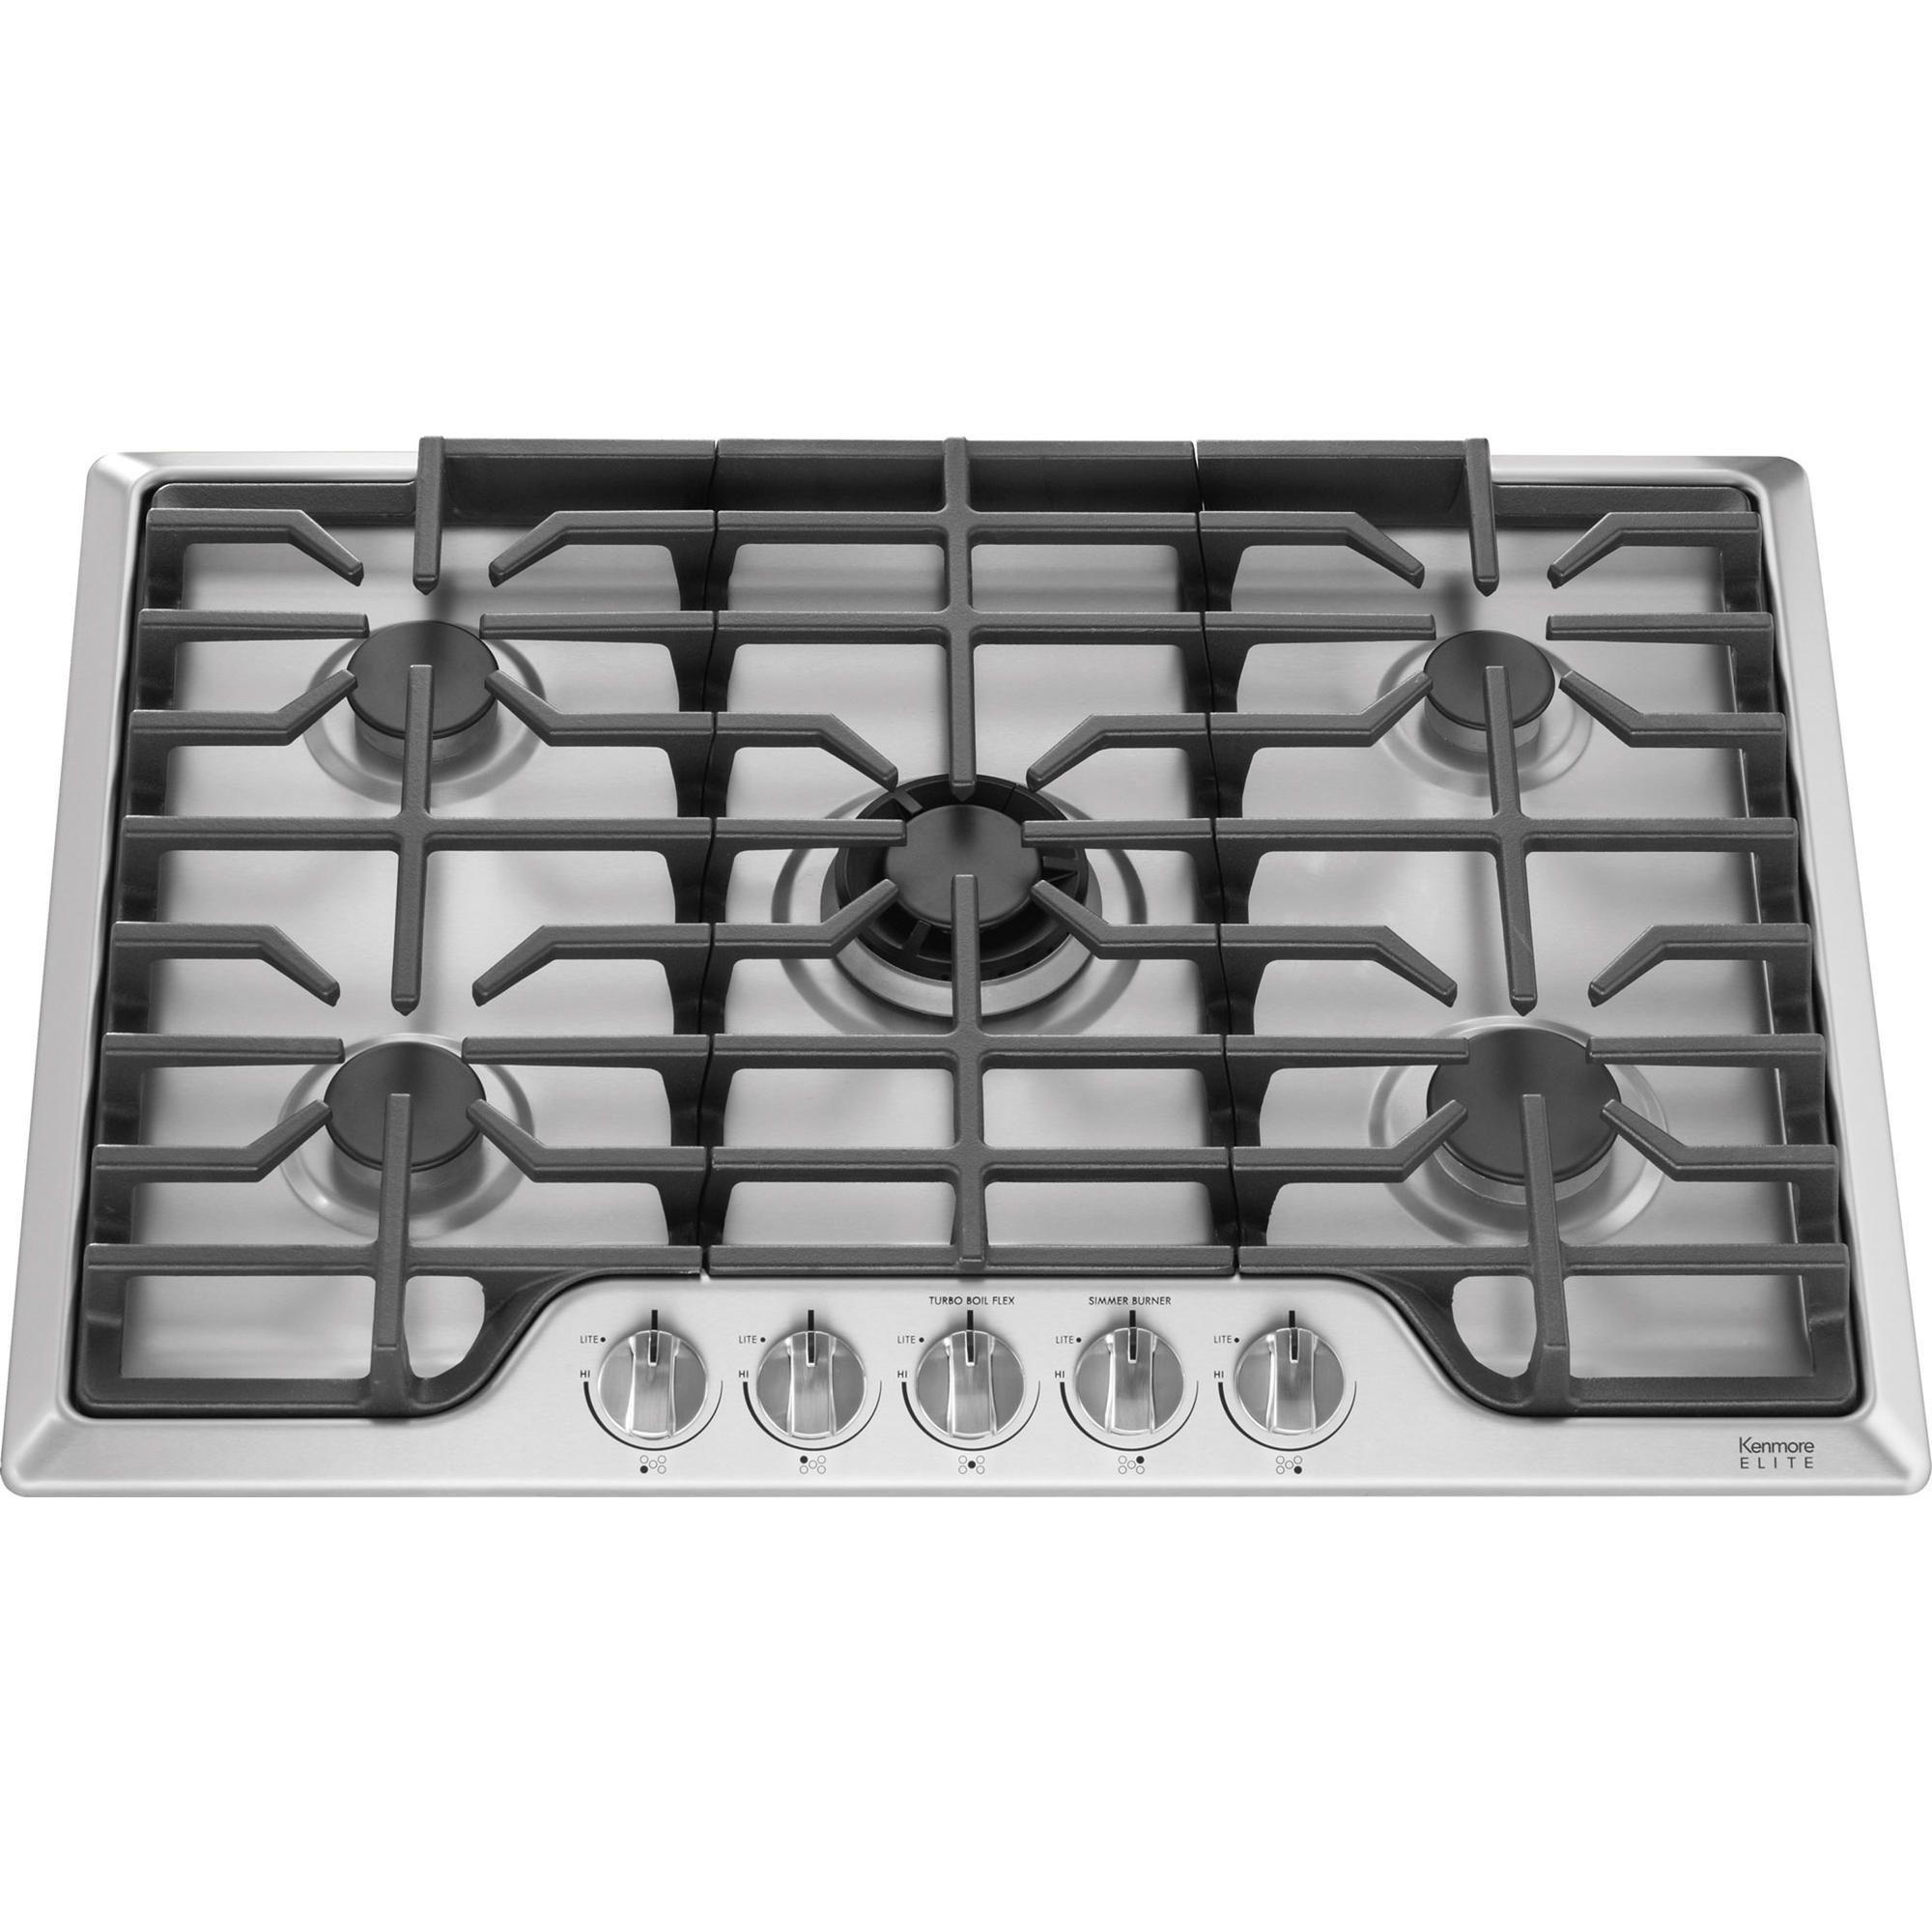 The Kenmore Elite Gas Cooktop Features Five Versatile Burner Options Including A Flexible Btu Center B